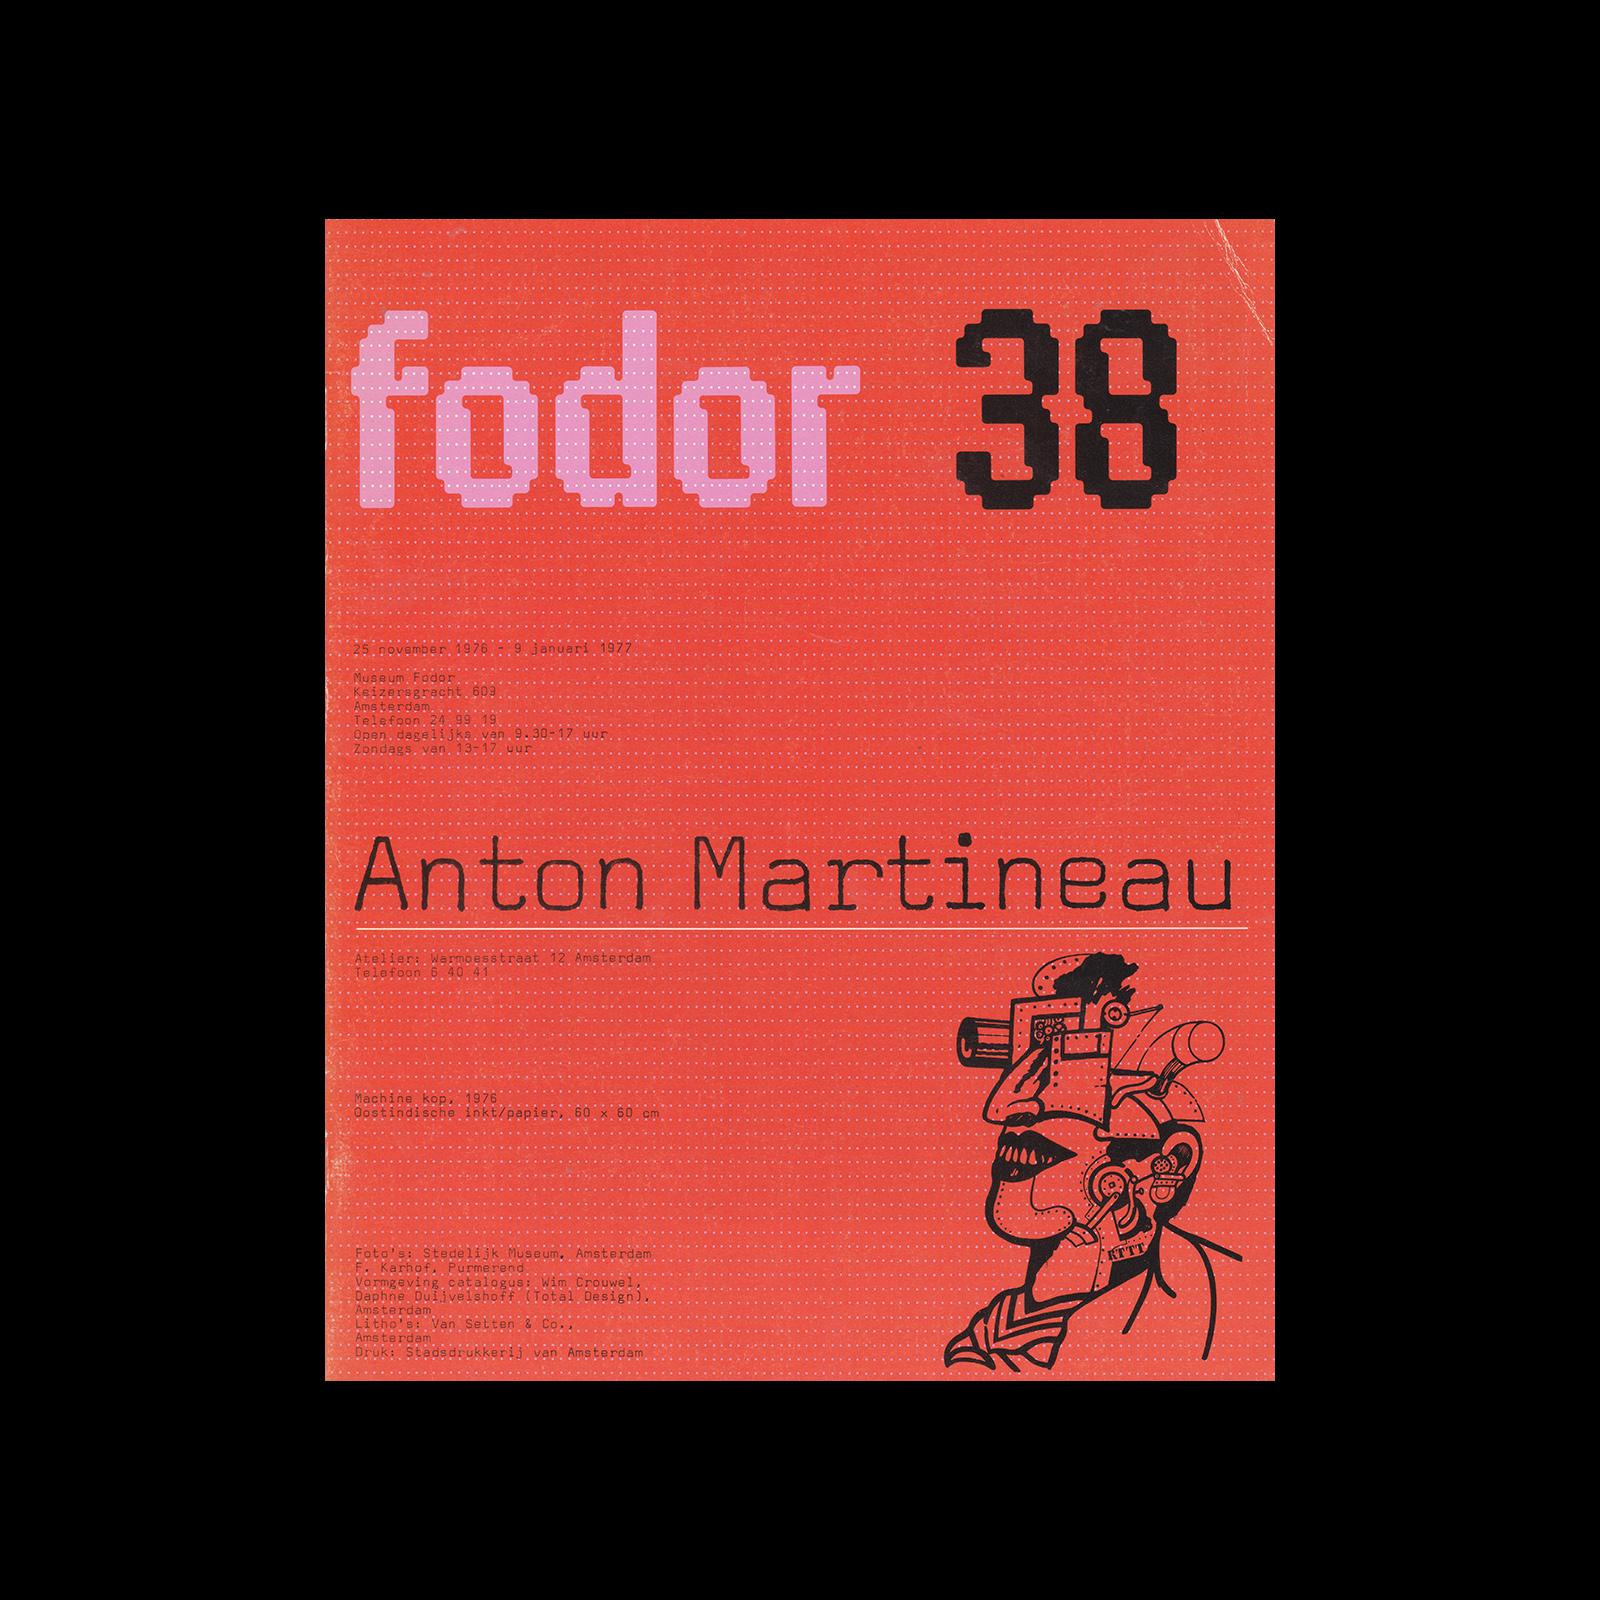 Fodor 38, 1977 - Anton Martineau. Designed by Wim Crouwel and Daphne Duijvelshoff (Total Design)